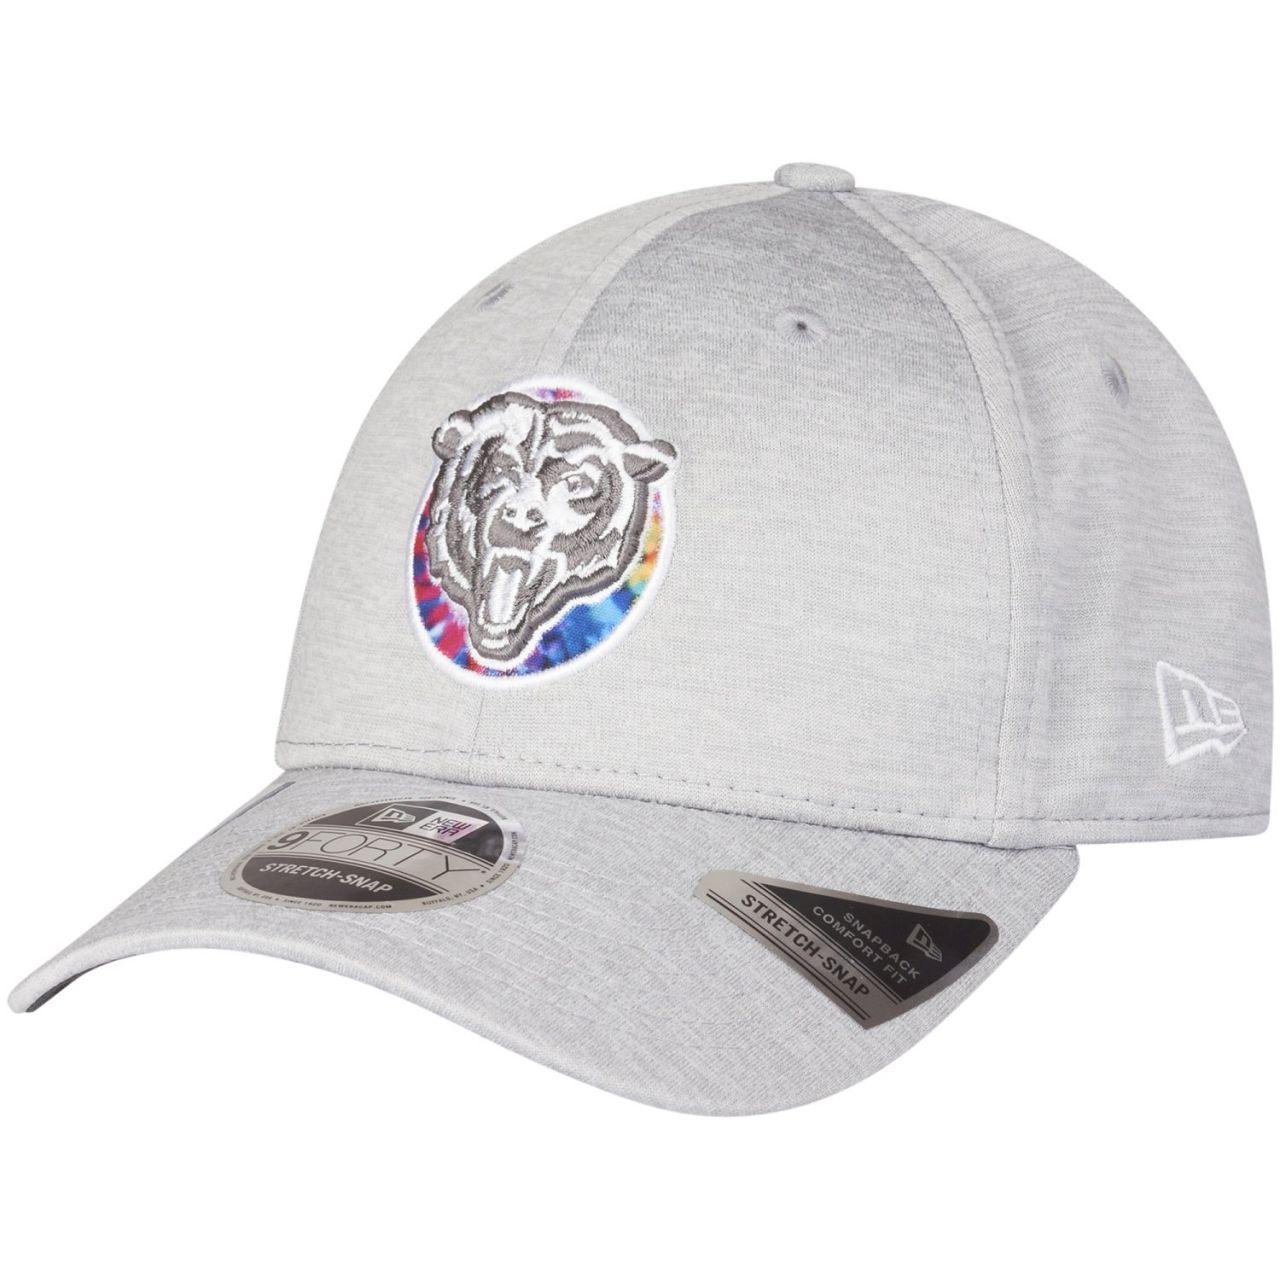 amfoo - New Era 9FORTY Stretch Cap - CRUCIAL CATCH Chicago Bears